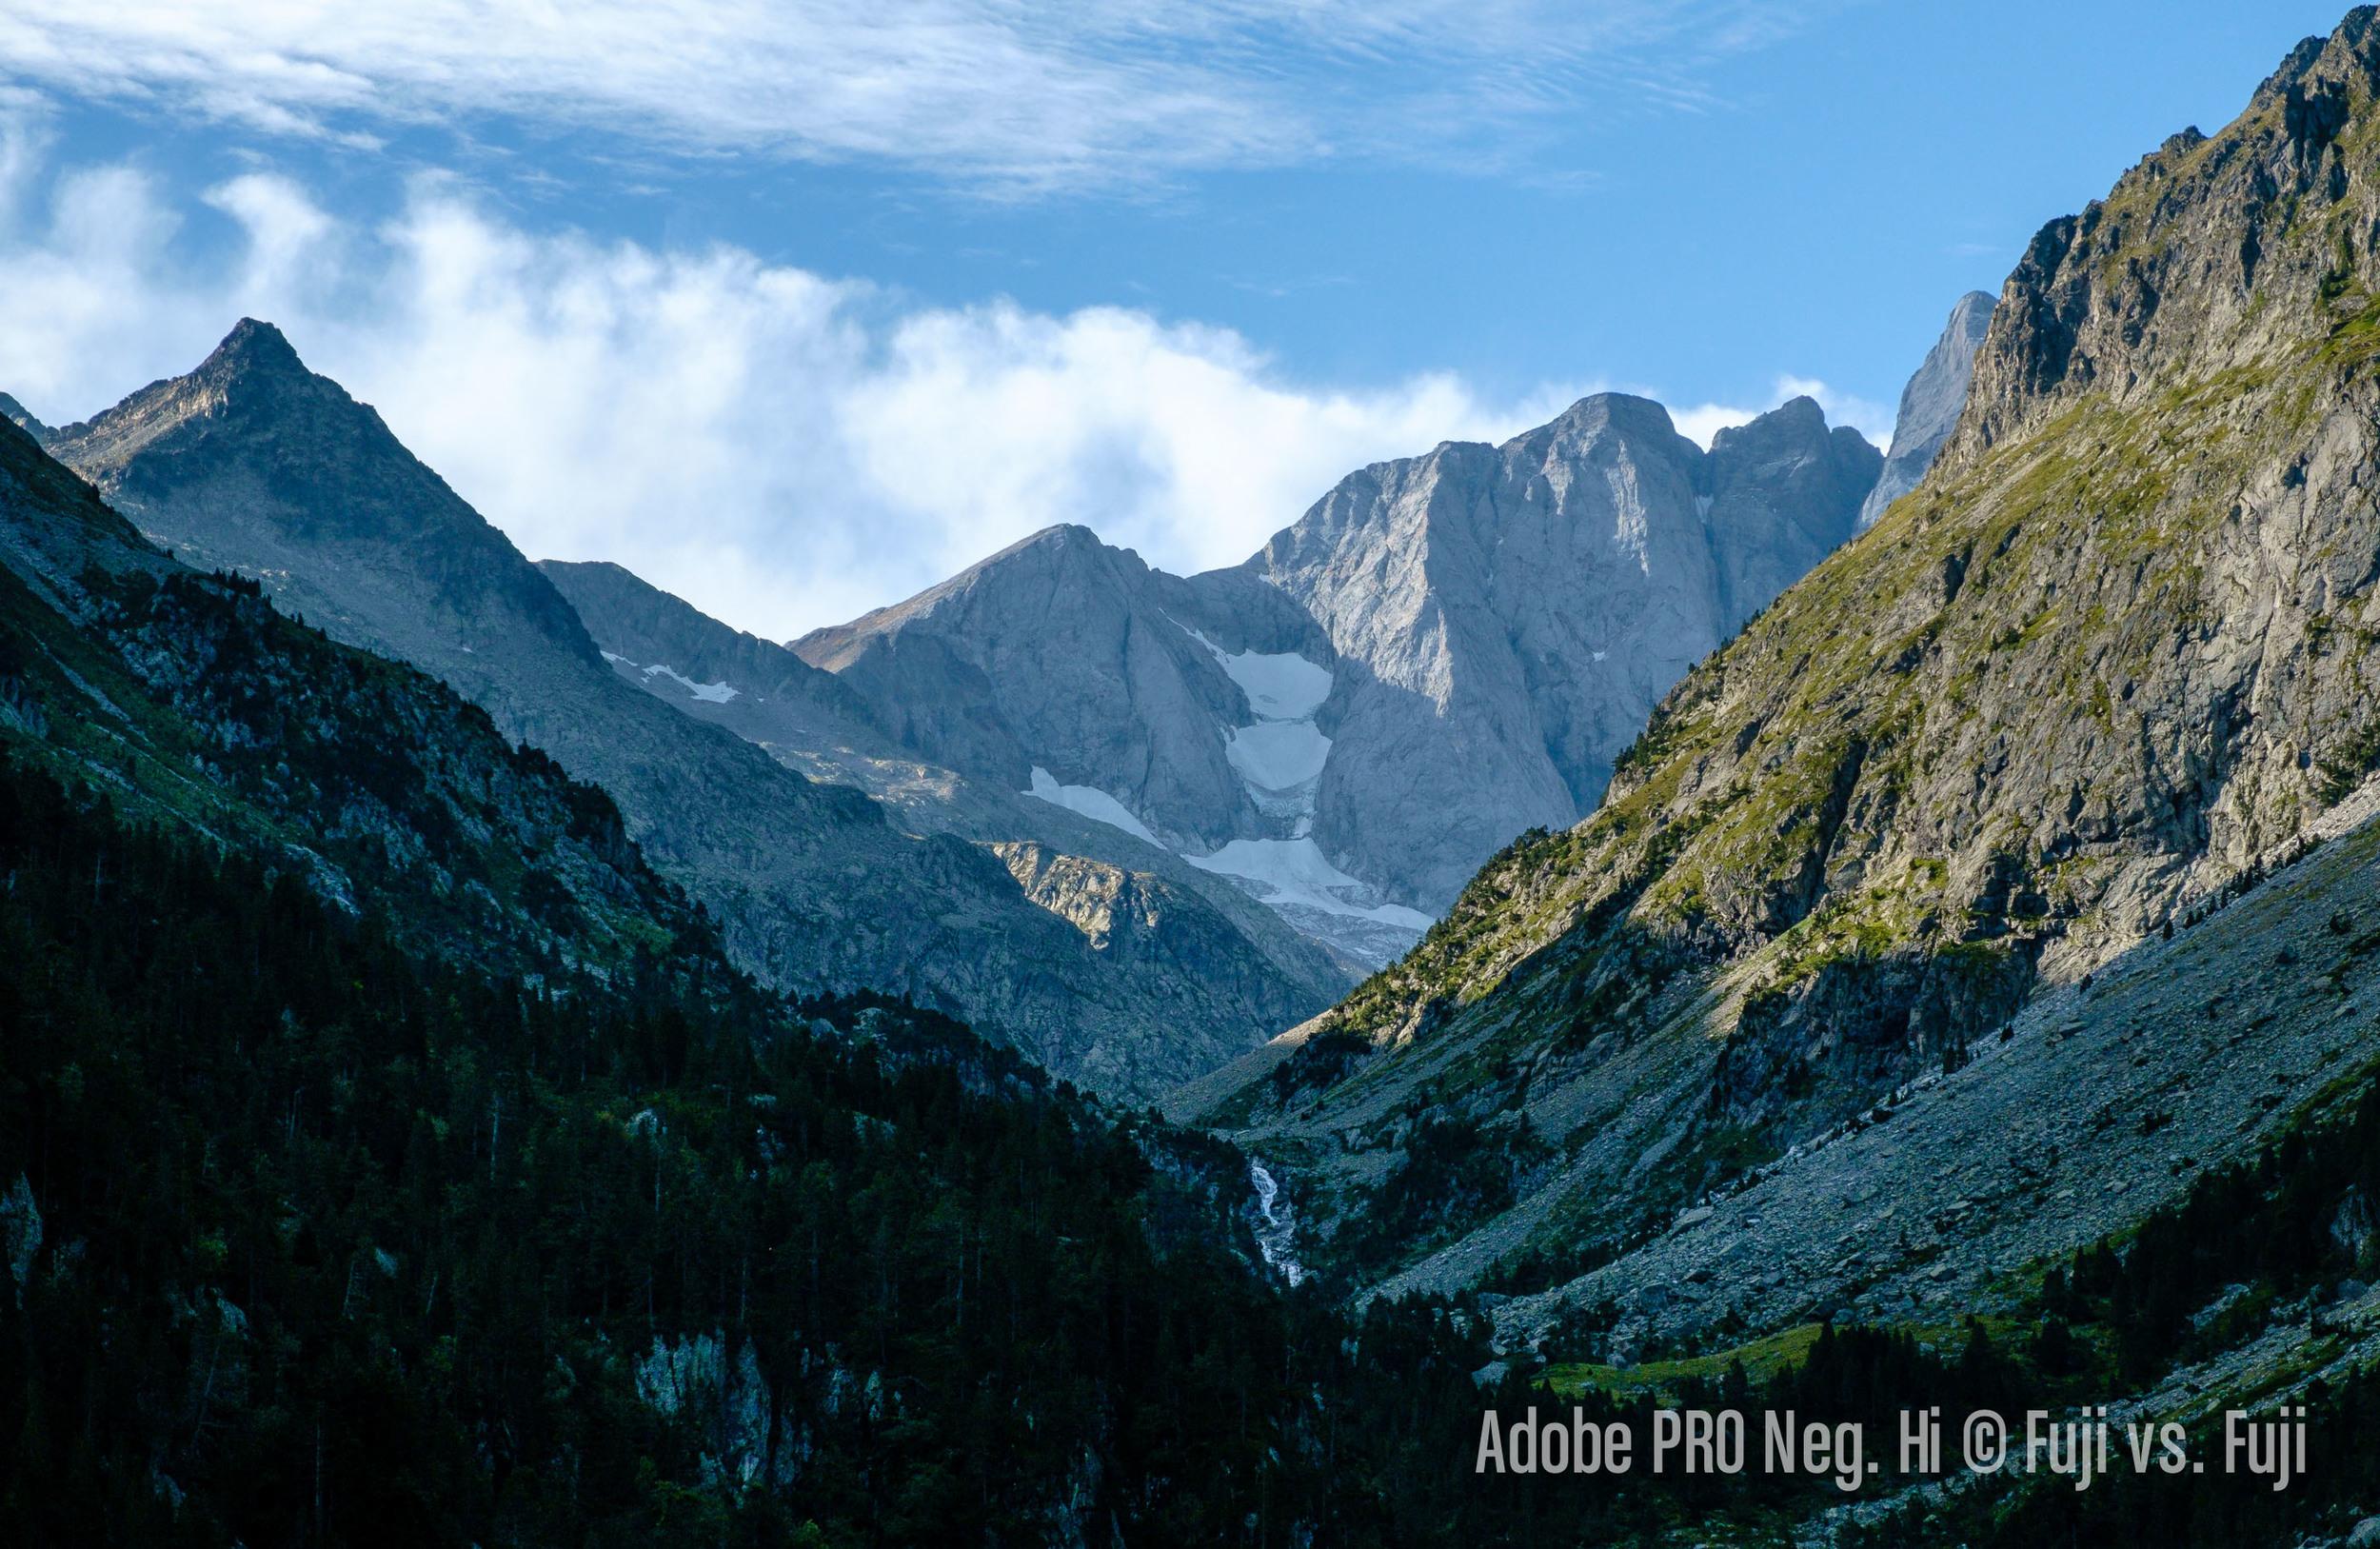 5 Adobe PRO Neg Hi.jpg